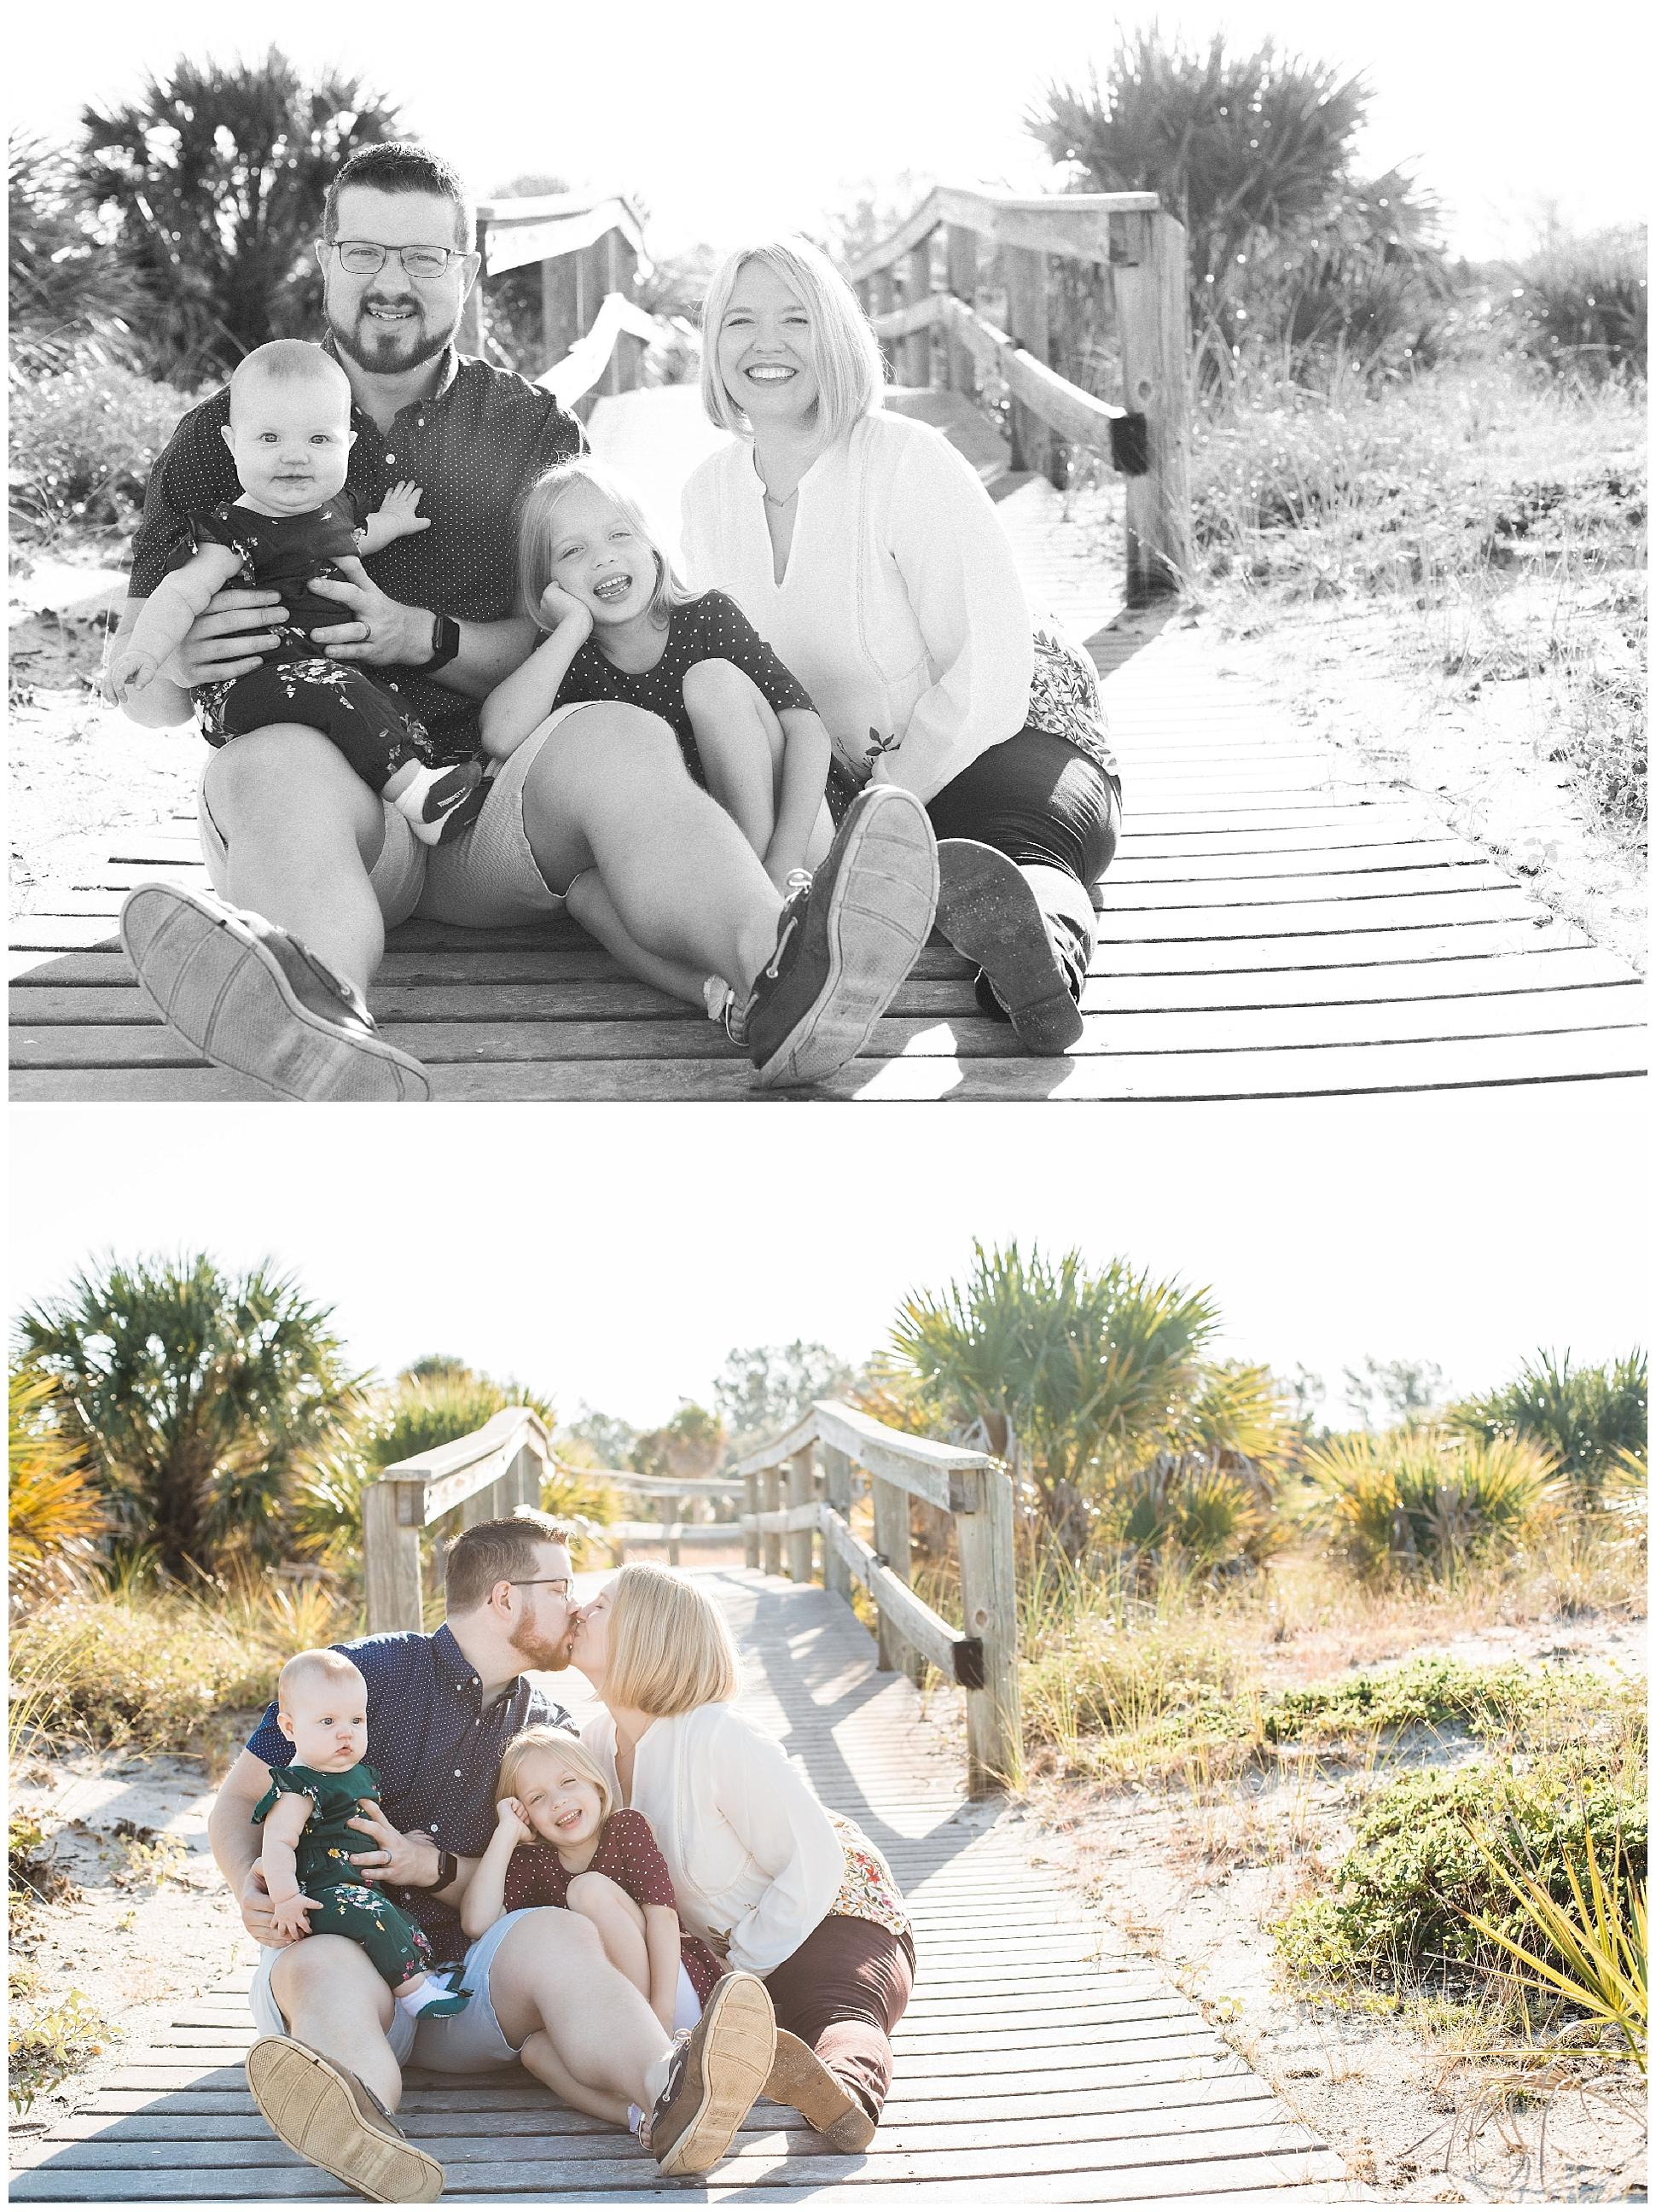 jessicafredericks_photography_family_beach_baby_clearwater_st pete beach_0009.jpg